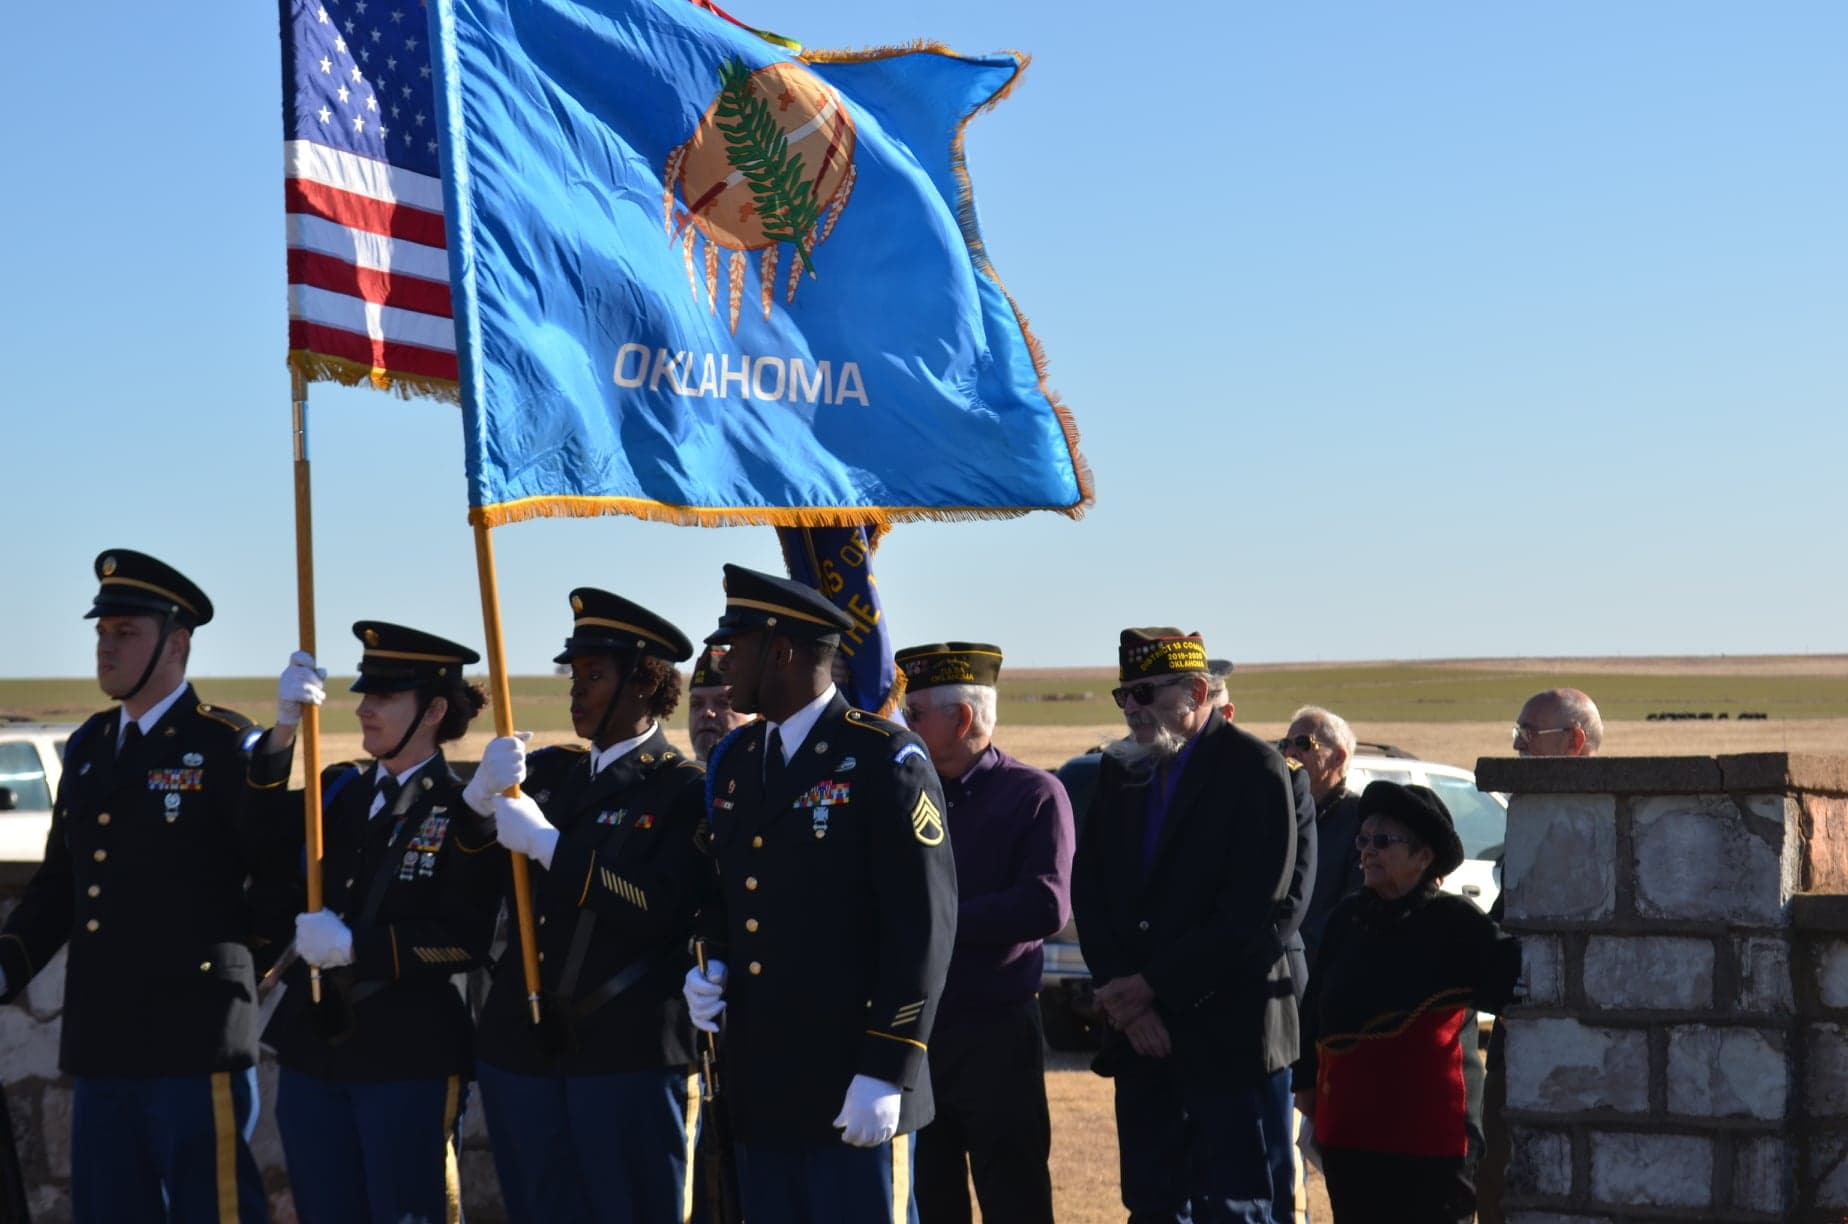 POW Ceremony 2019 Oklahoma American Flags